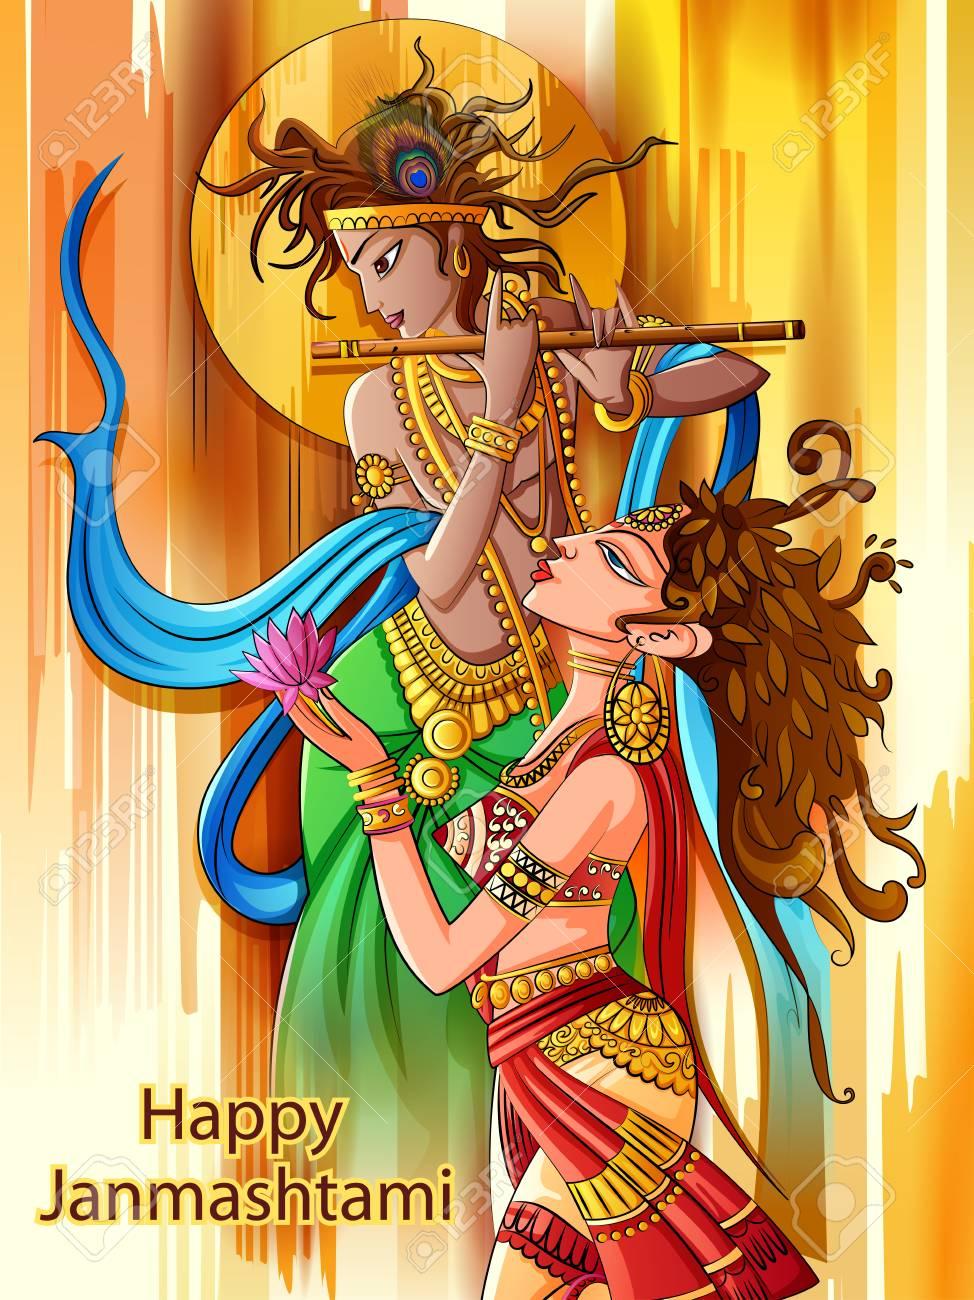 Lord Krishna playing bansuri flute with Radha on Happy Janmashtami